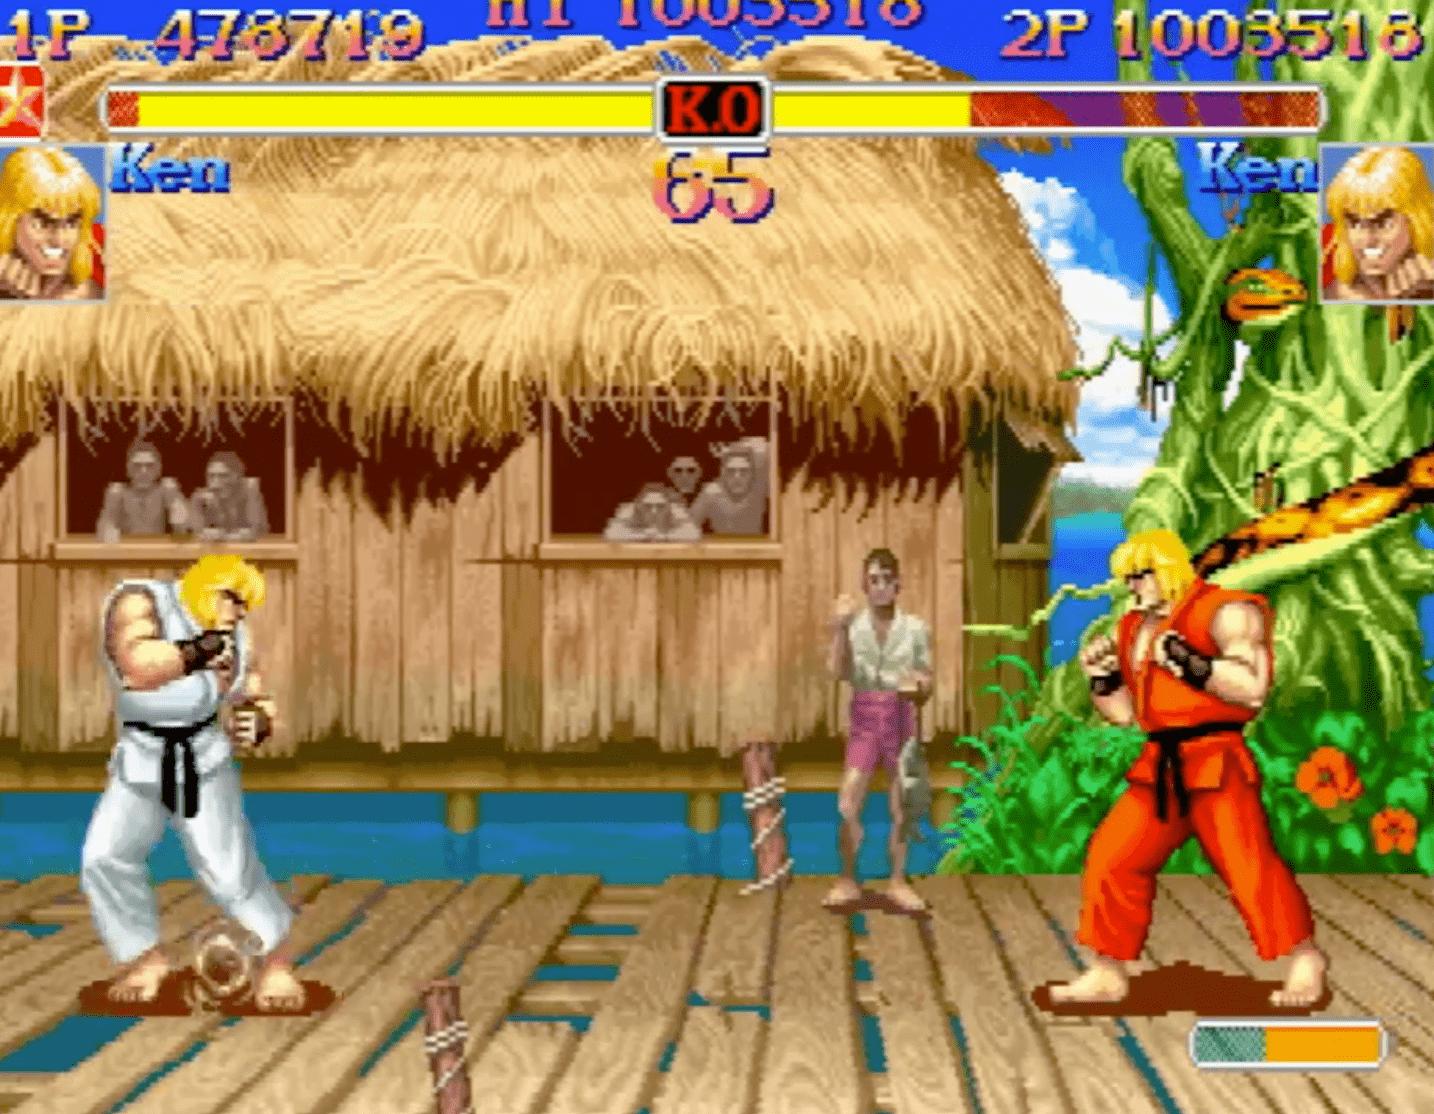 street fighter gameplay